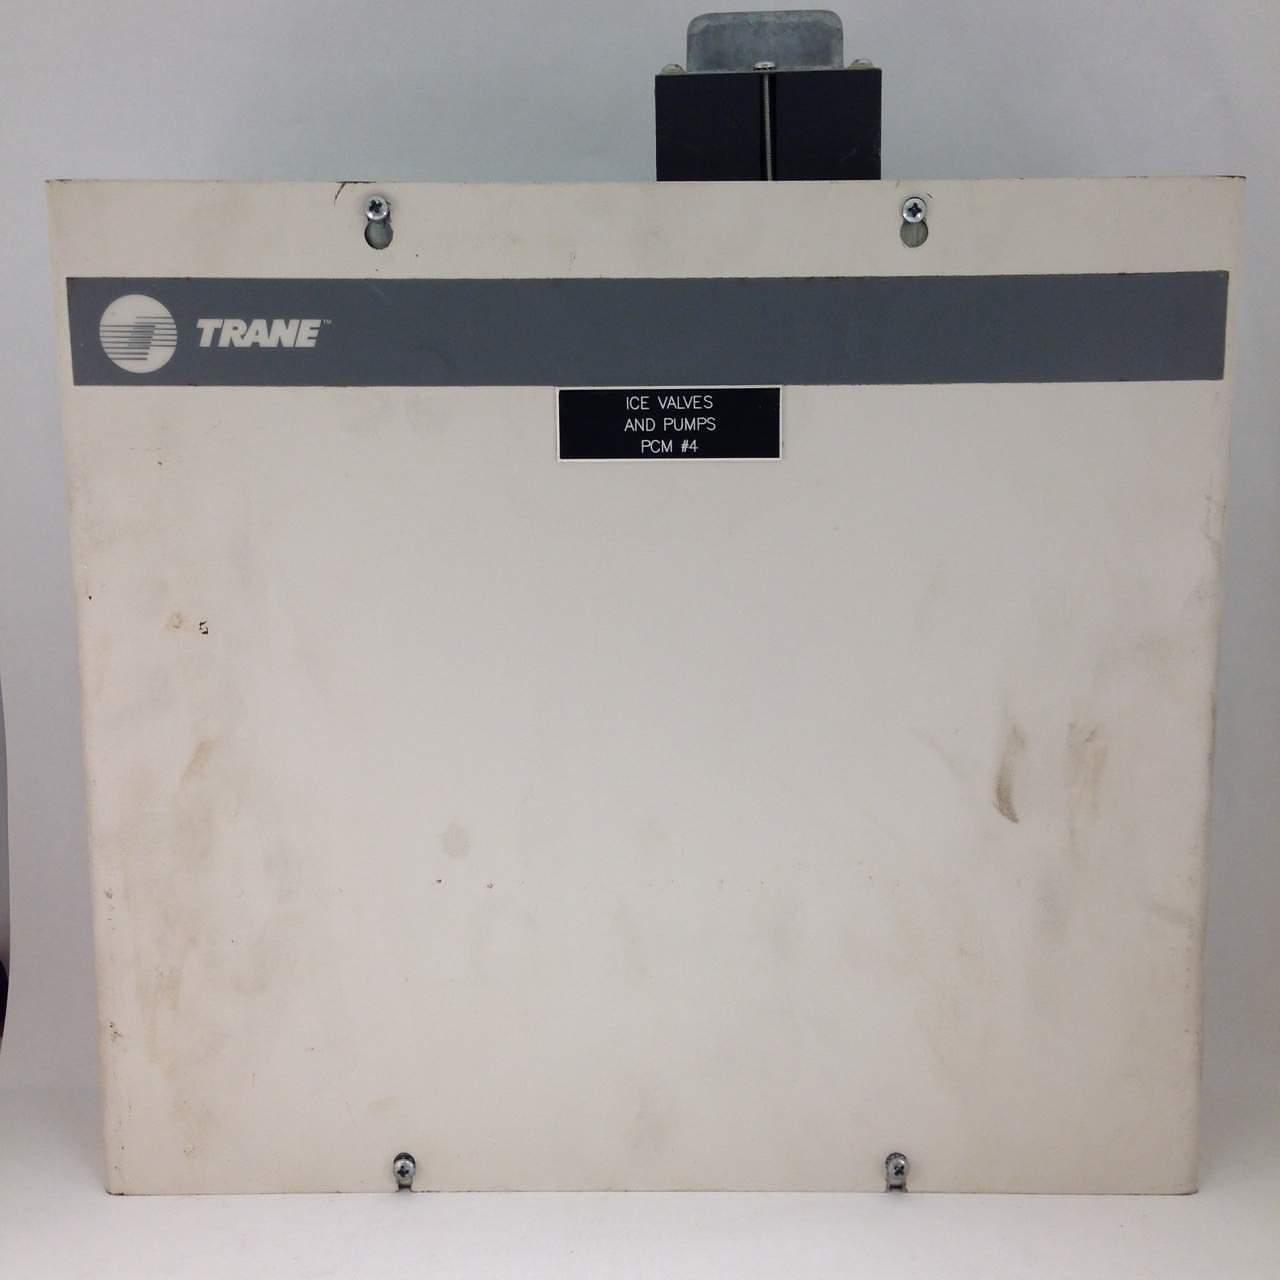 Trane Tracer Programmable Control Module PCM 4950-0365